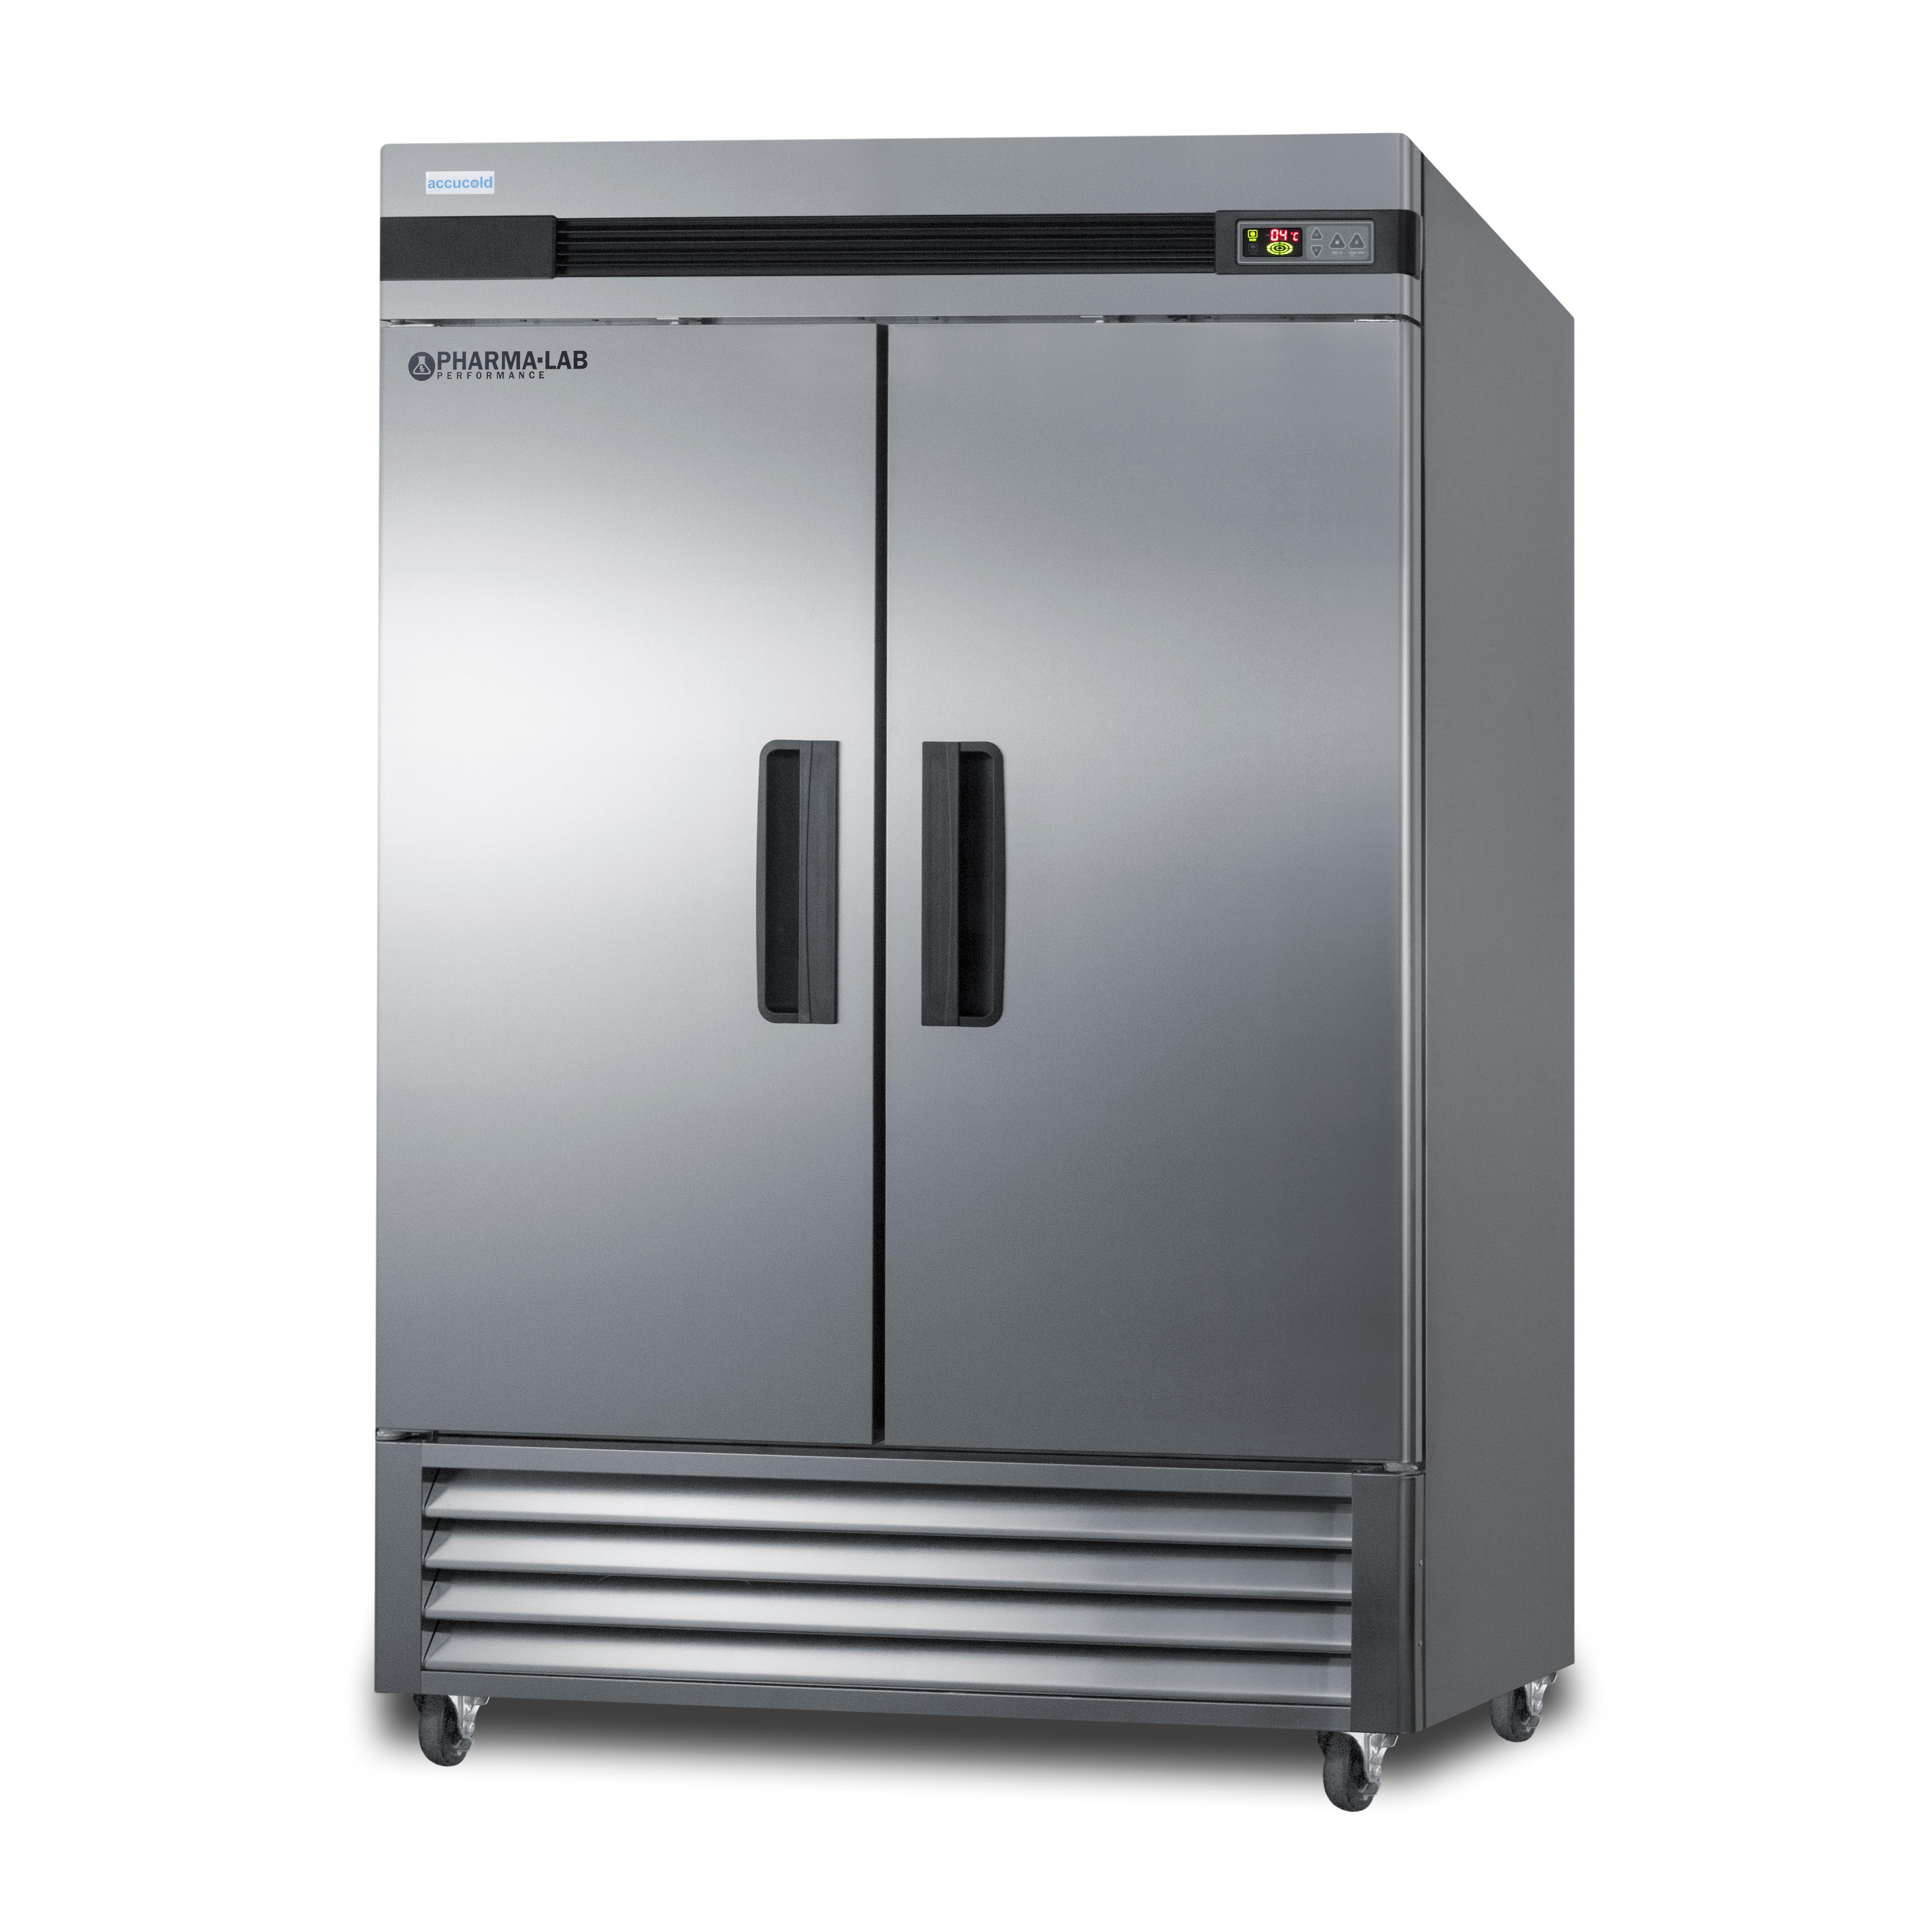 Summit Appliance ARS49ML refrigerator, medical